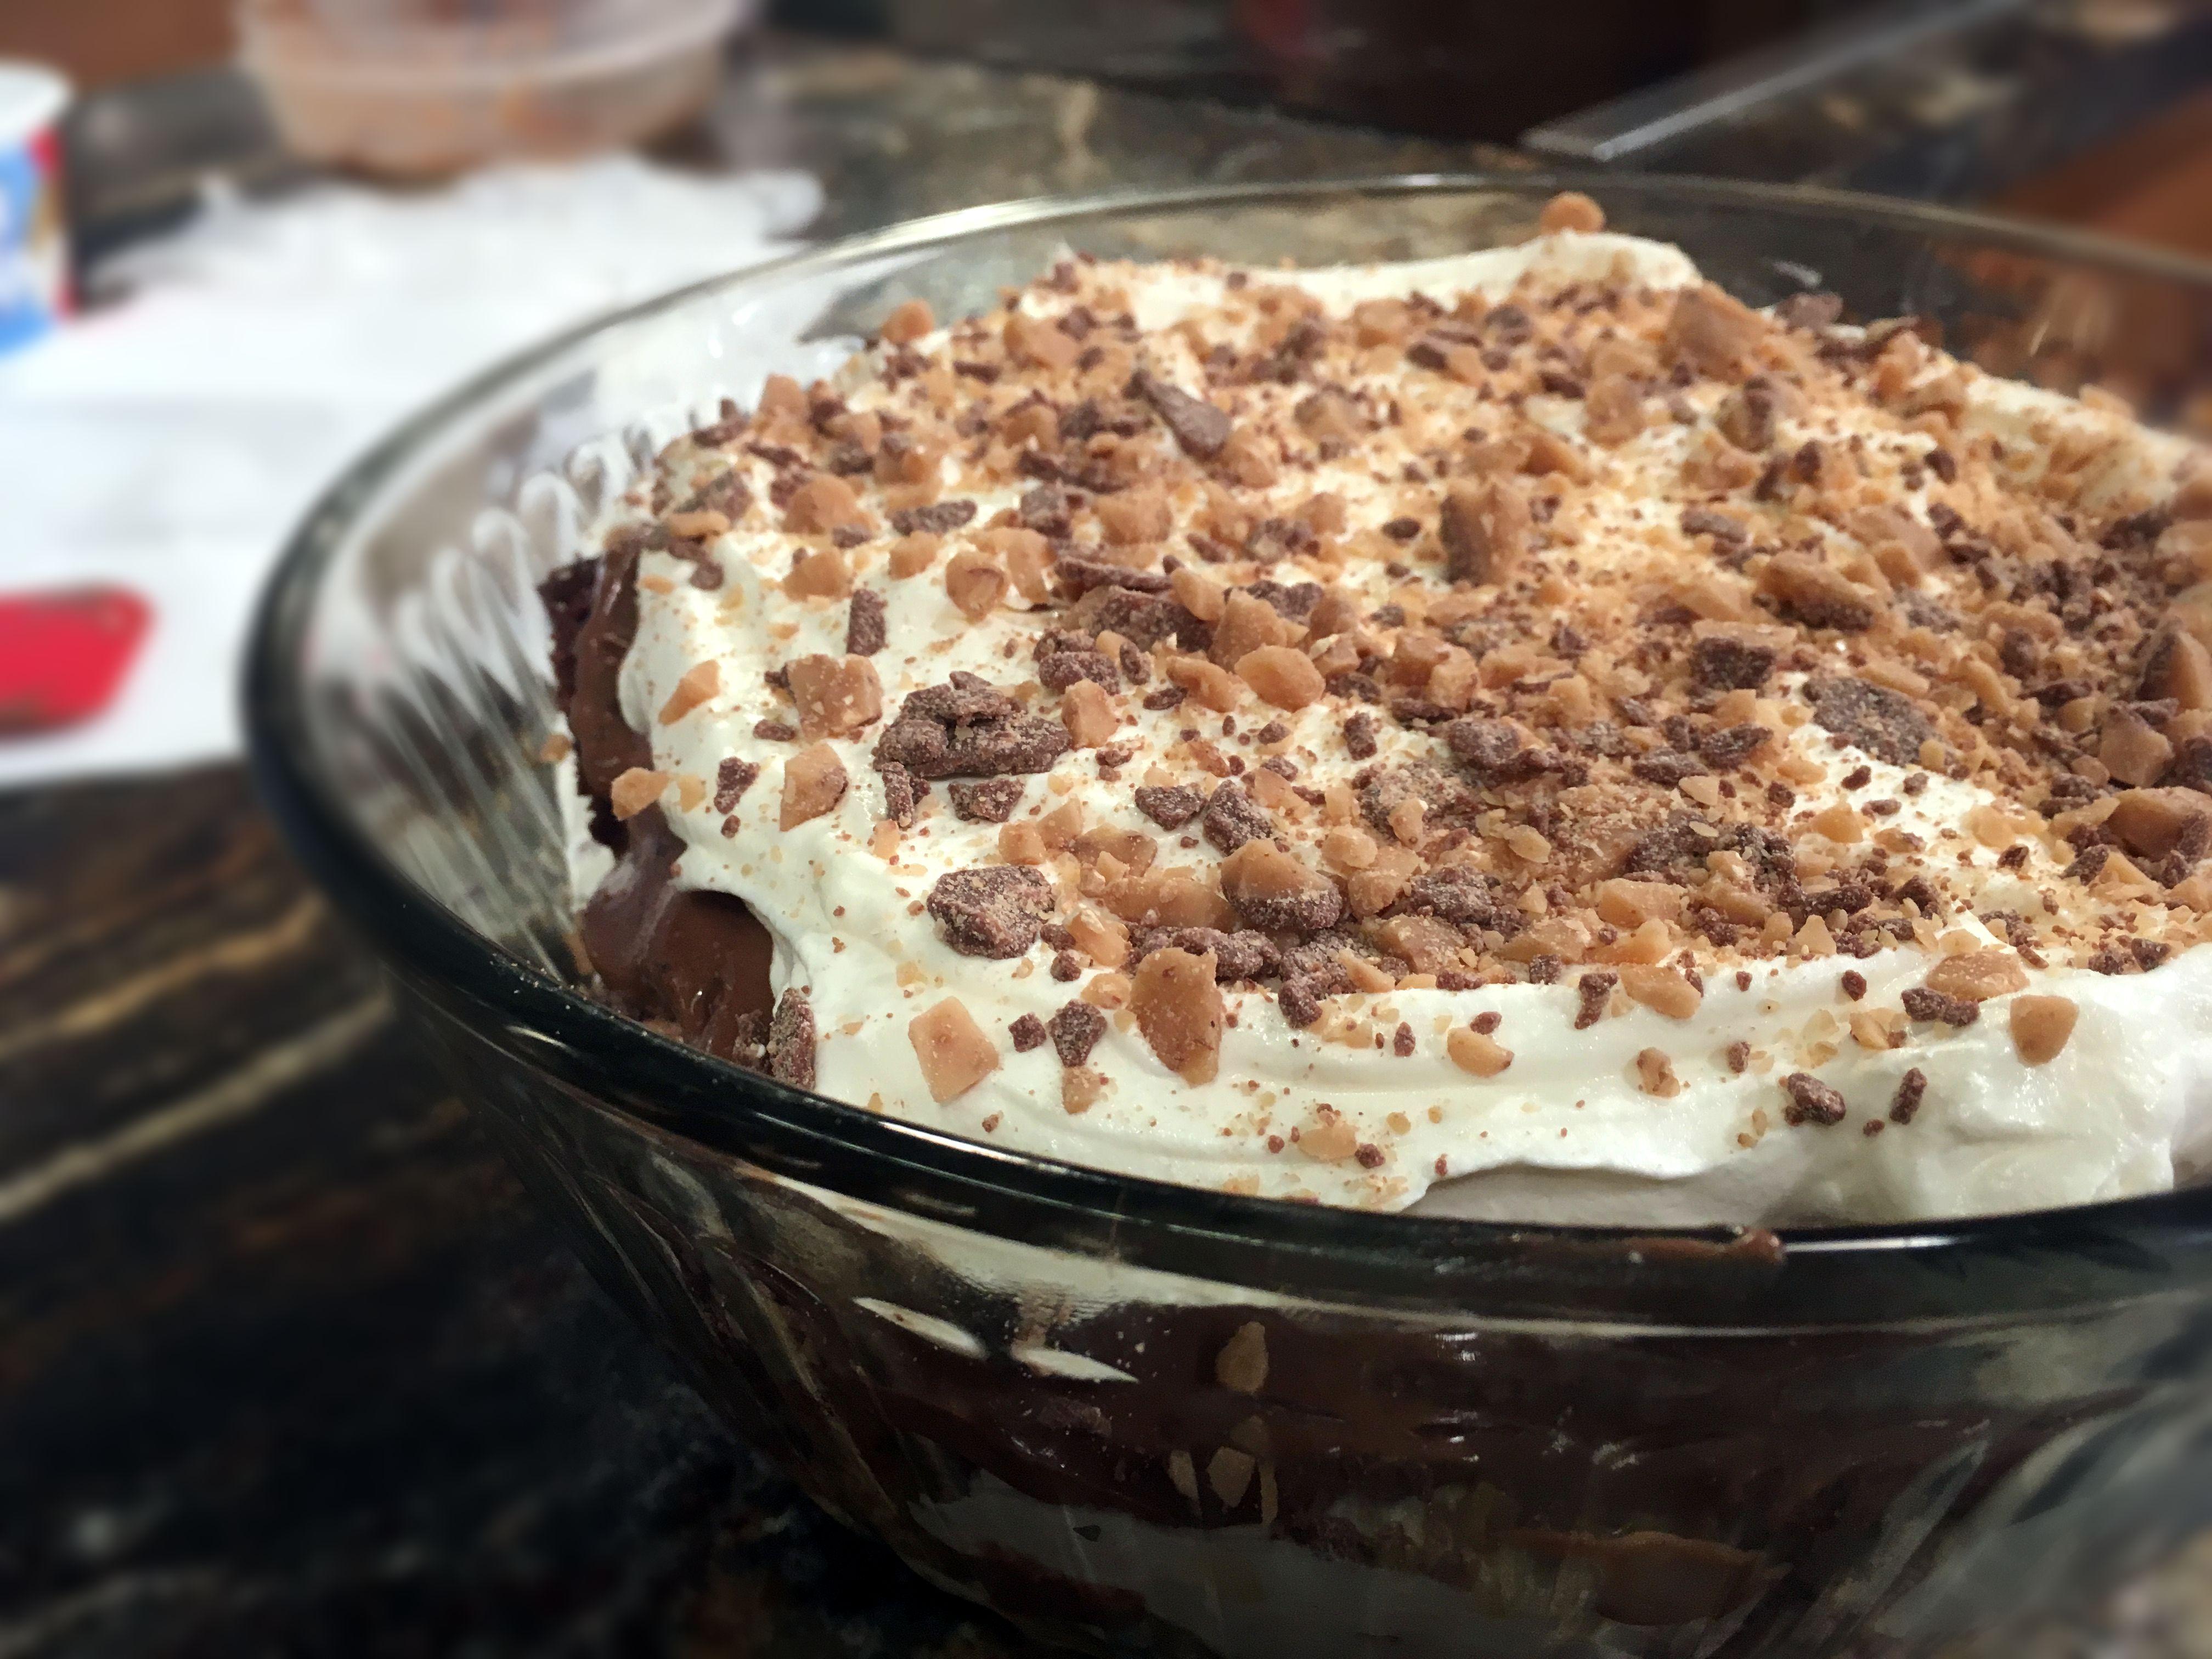 Layered Dessert Recipes With Cake Mix: Layered Kahlua Cake